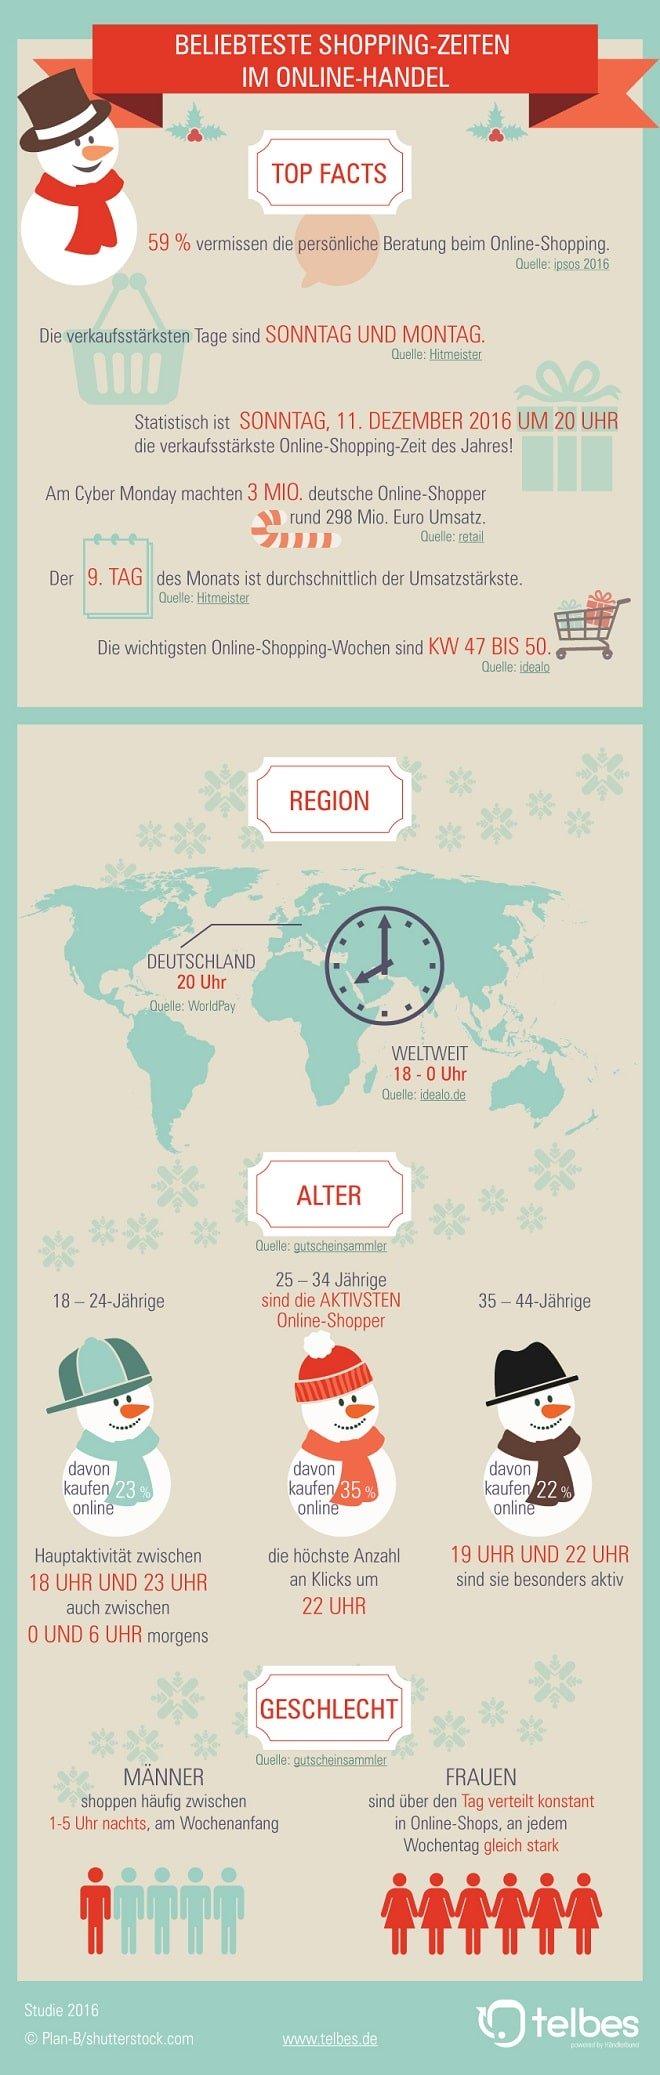 shoppingzeiten_infografik.jpg